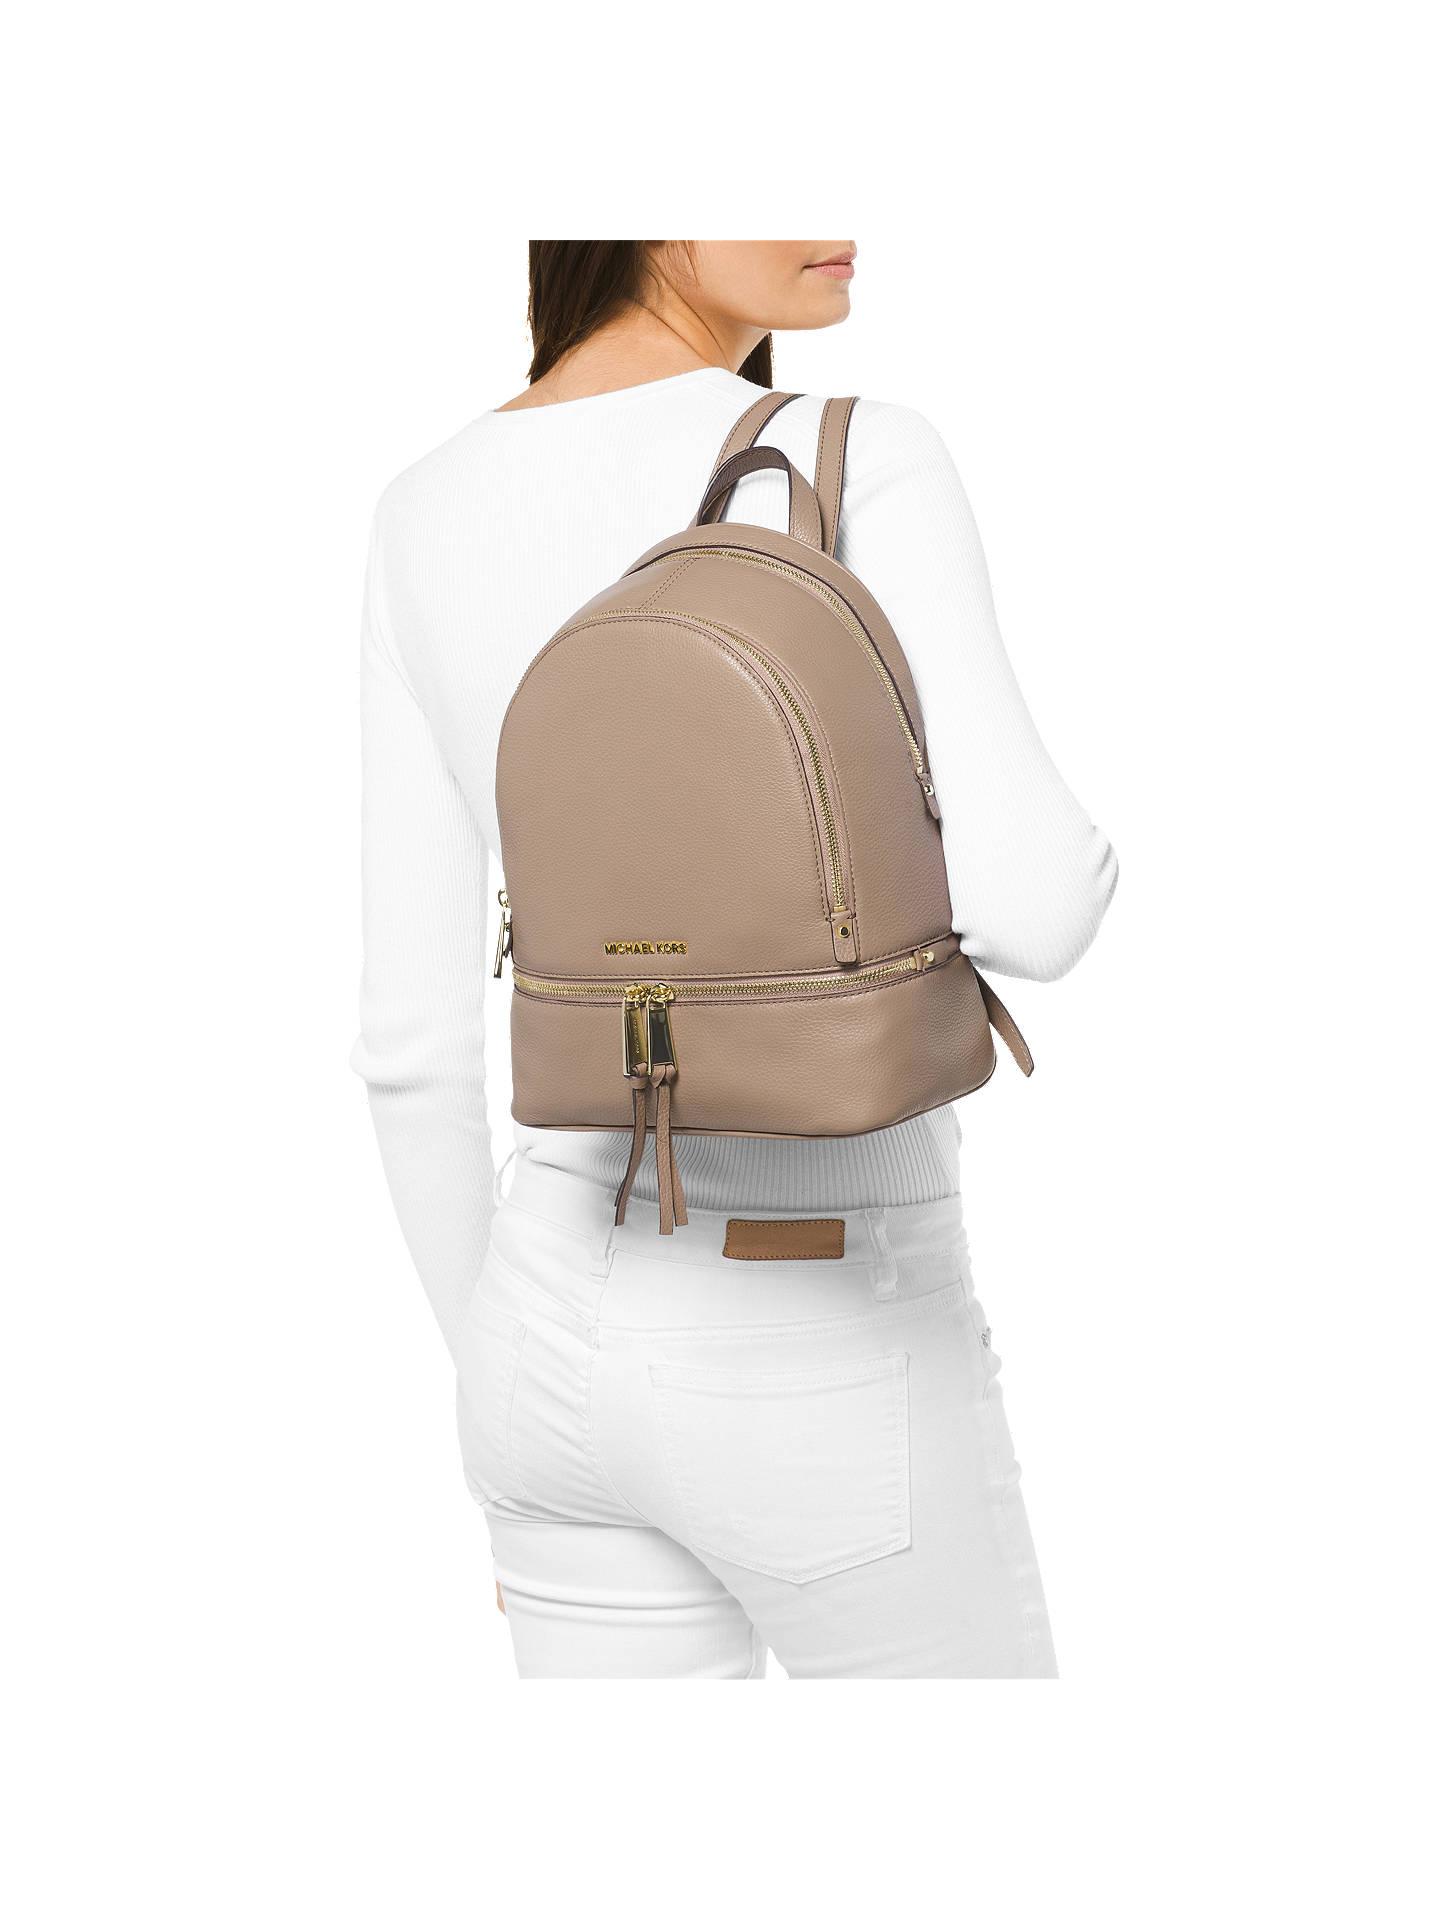 898a1ba35a2e ... Buy MICHAEL Michael Kors Rhea Leather Medium Backpack, Truffle Online  at johnlewis.com